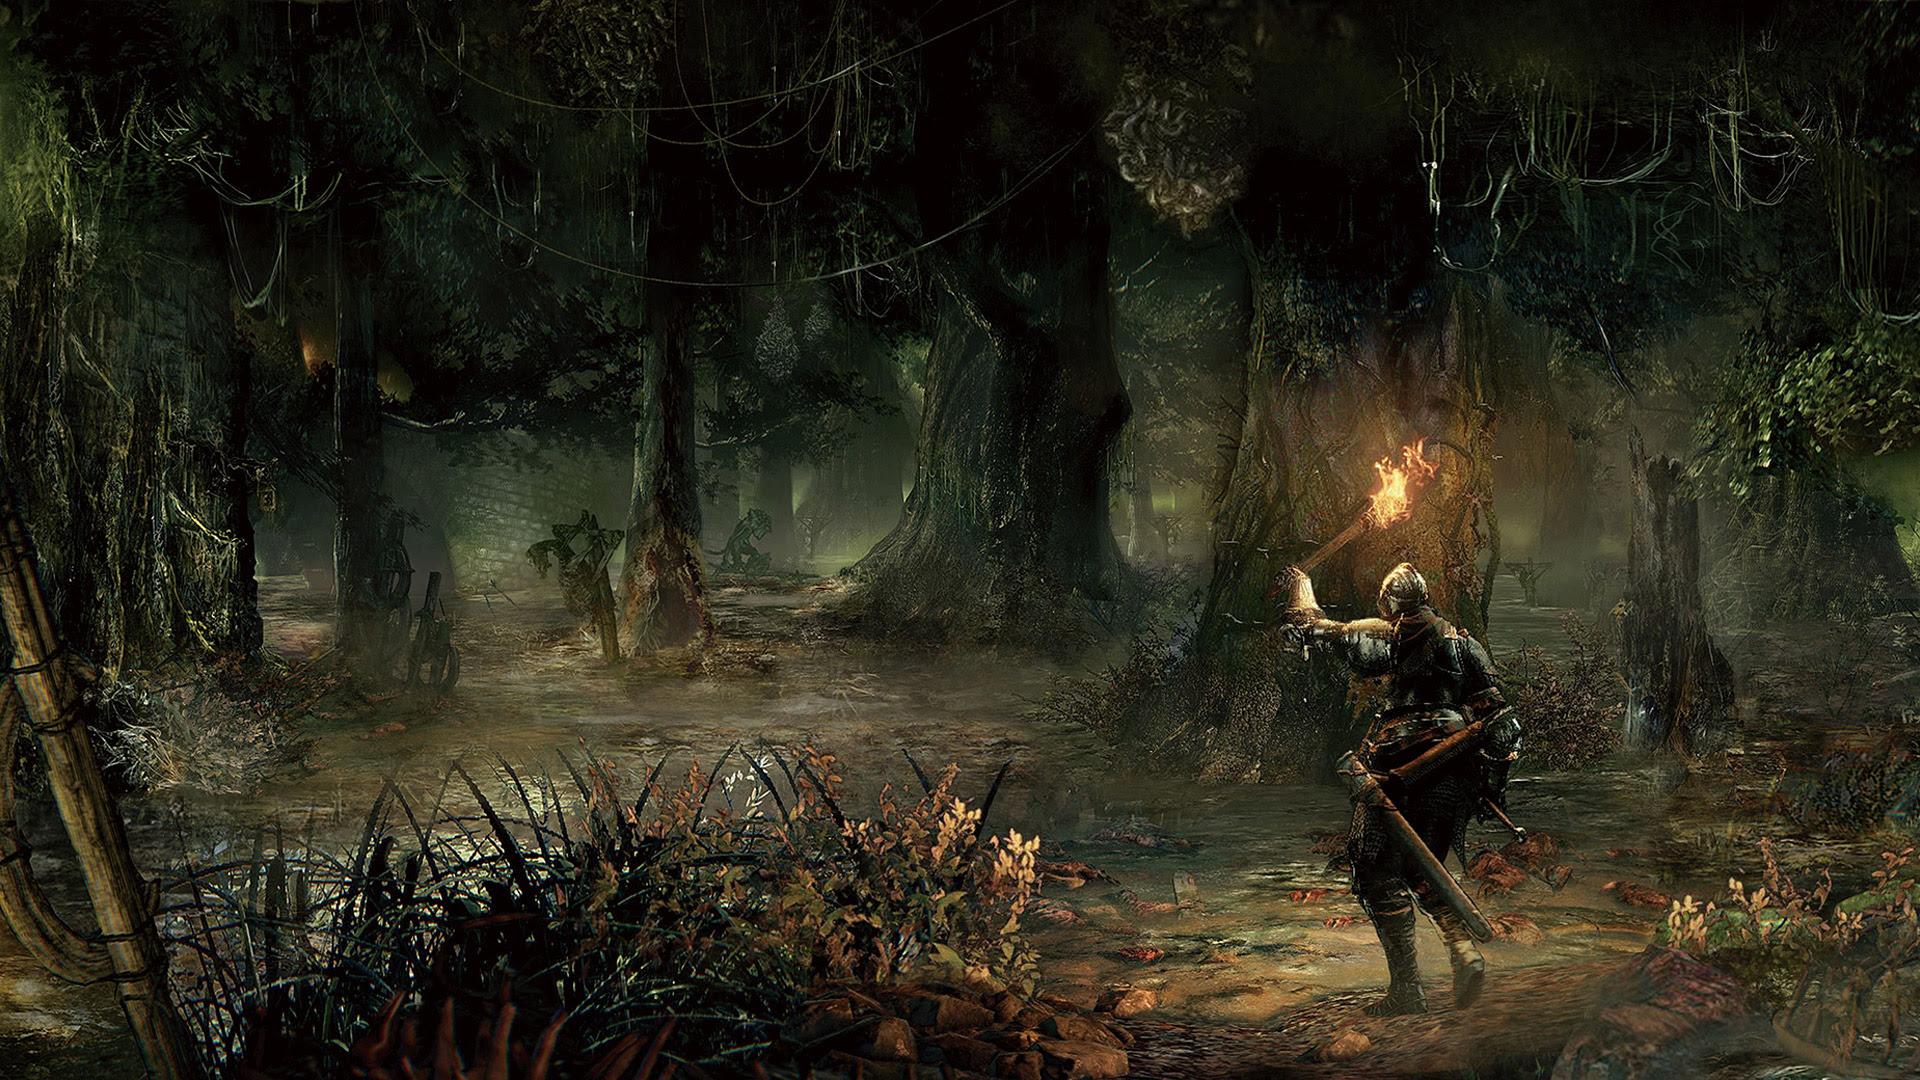 Dark Souls 3 Wallpaper 3